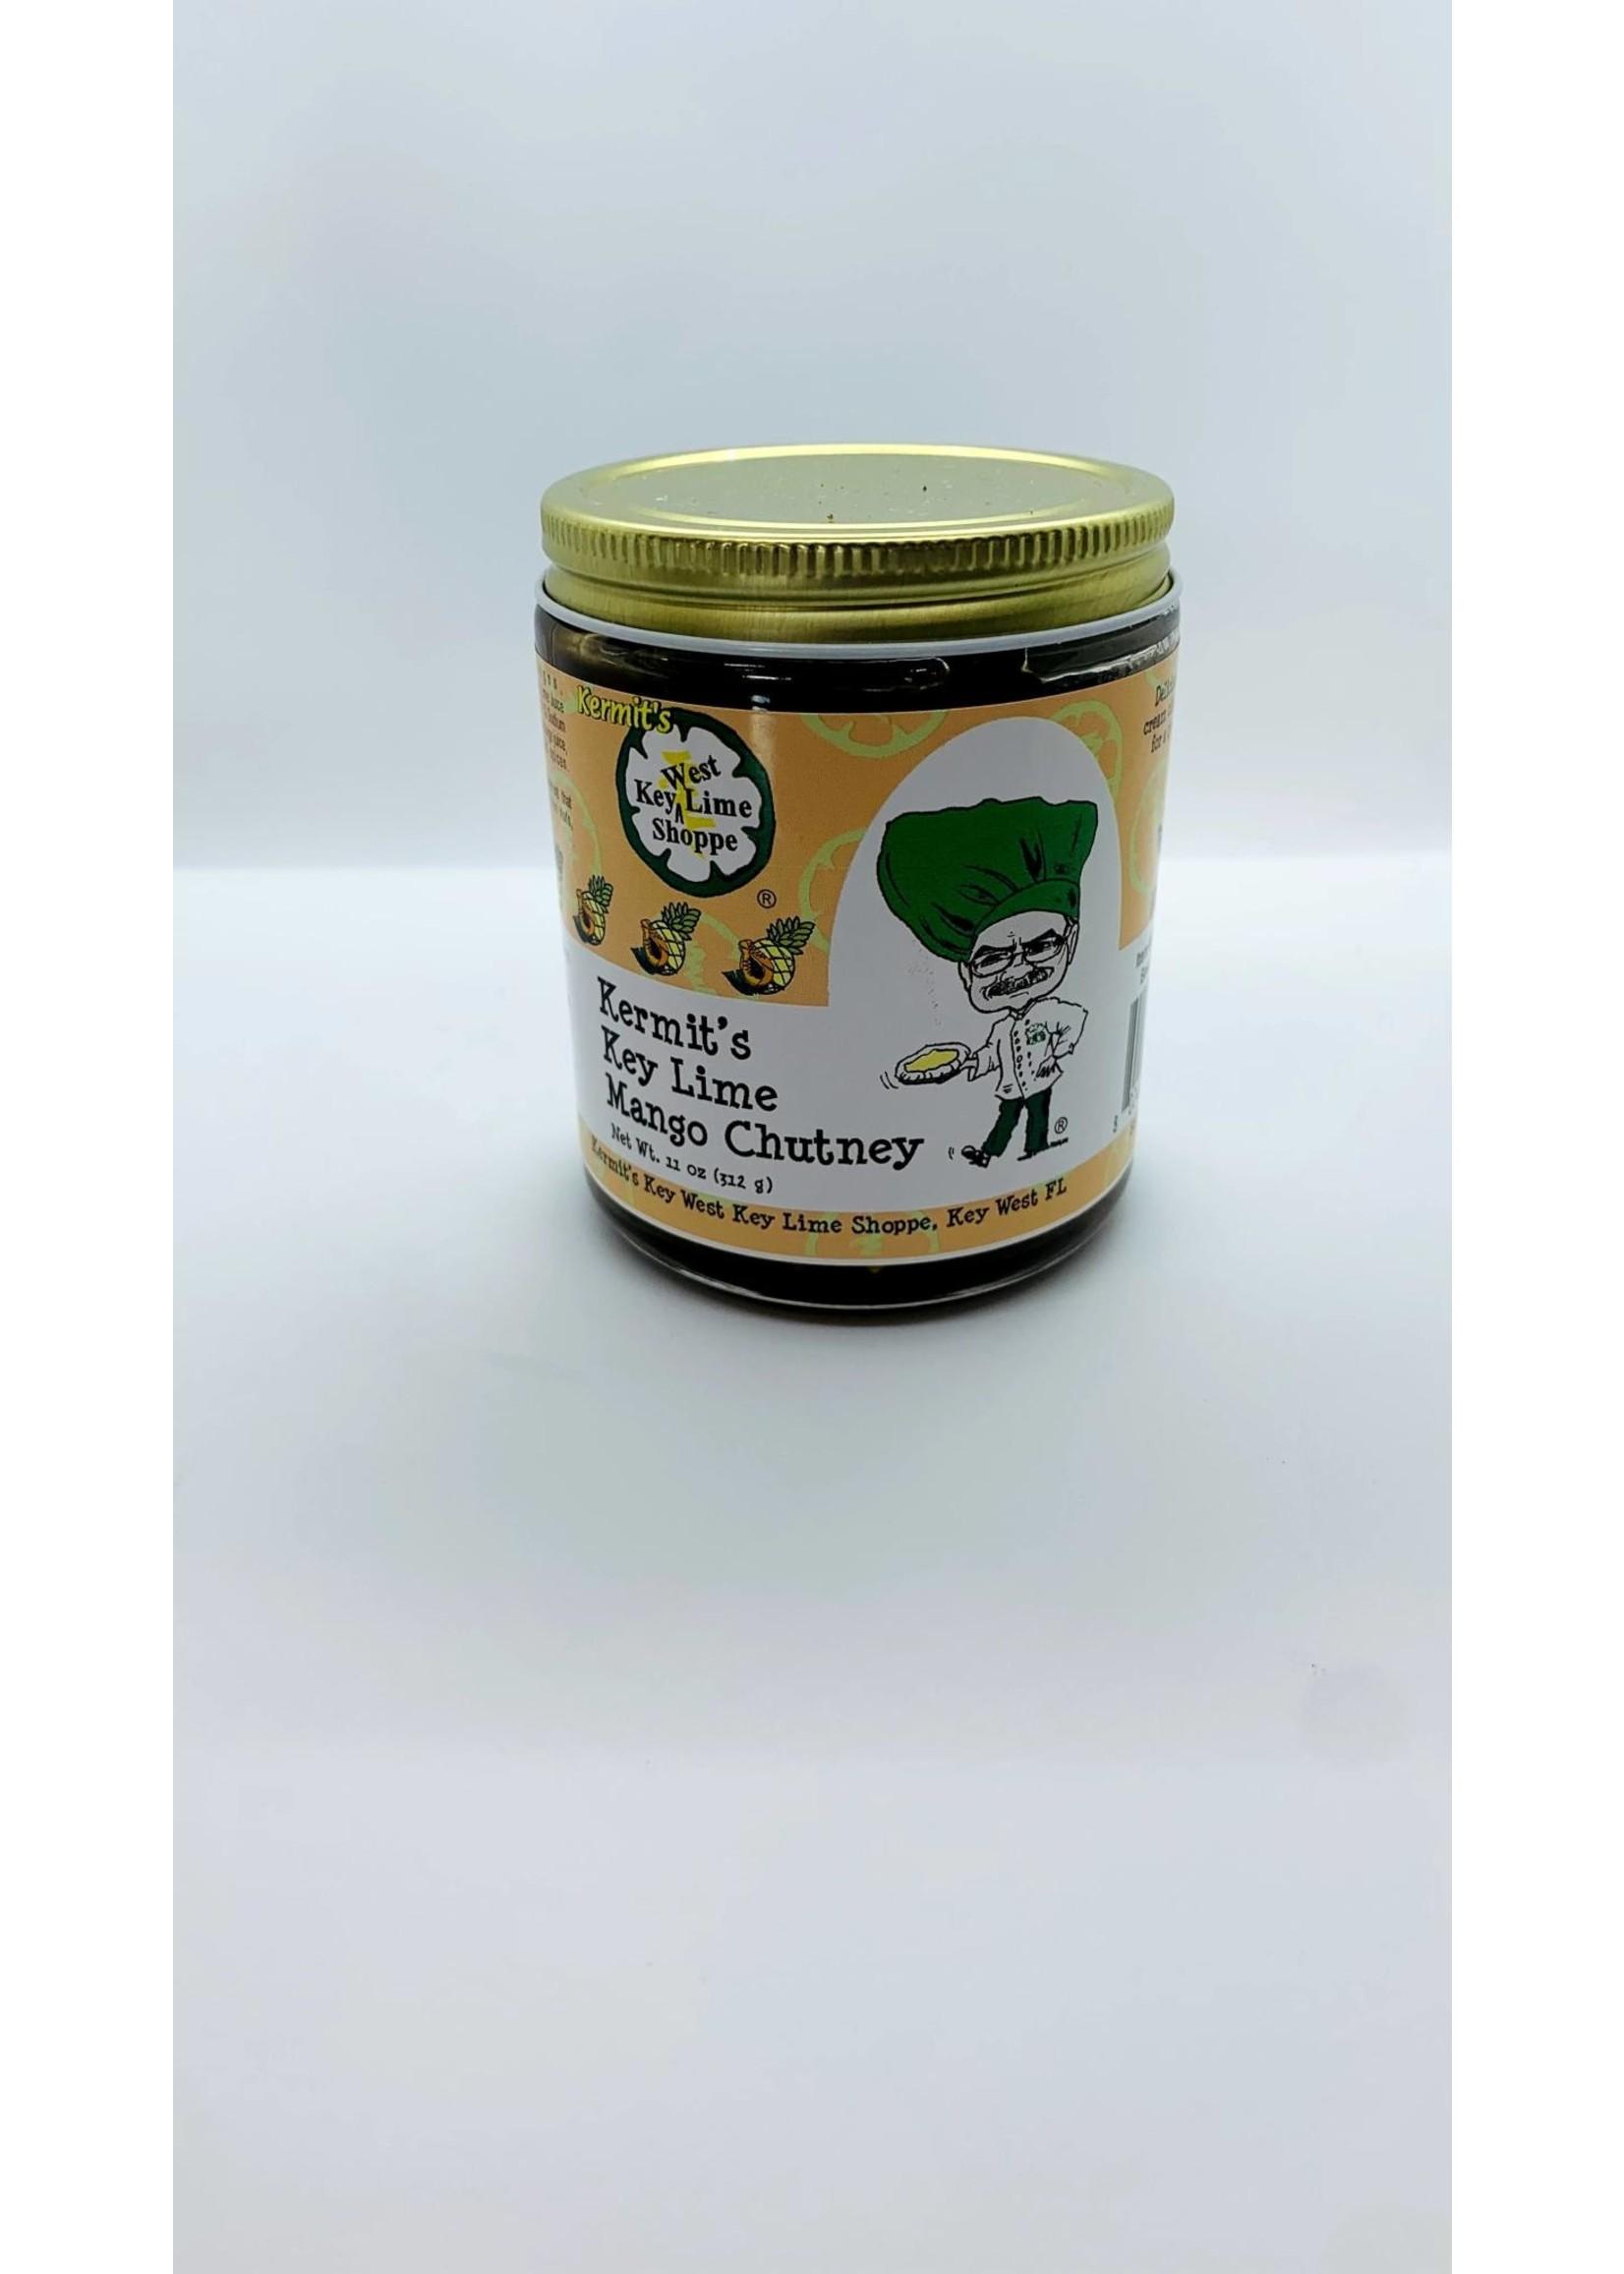 Kermit's Key Lime Mango Chutney 11oz